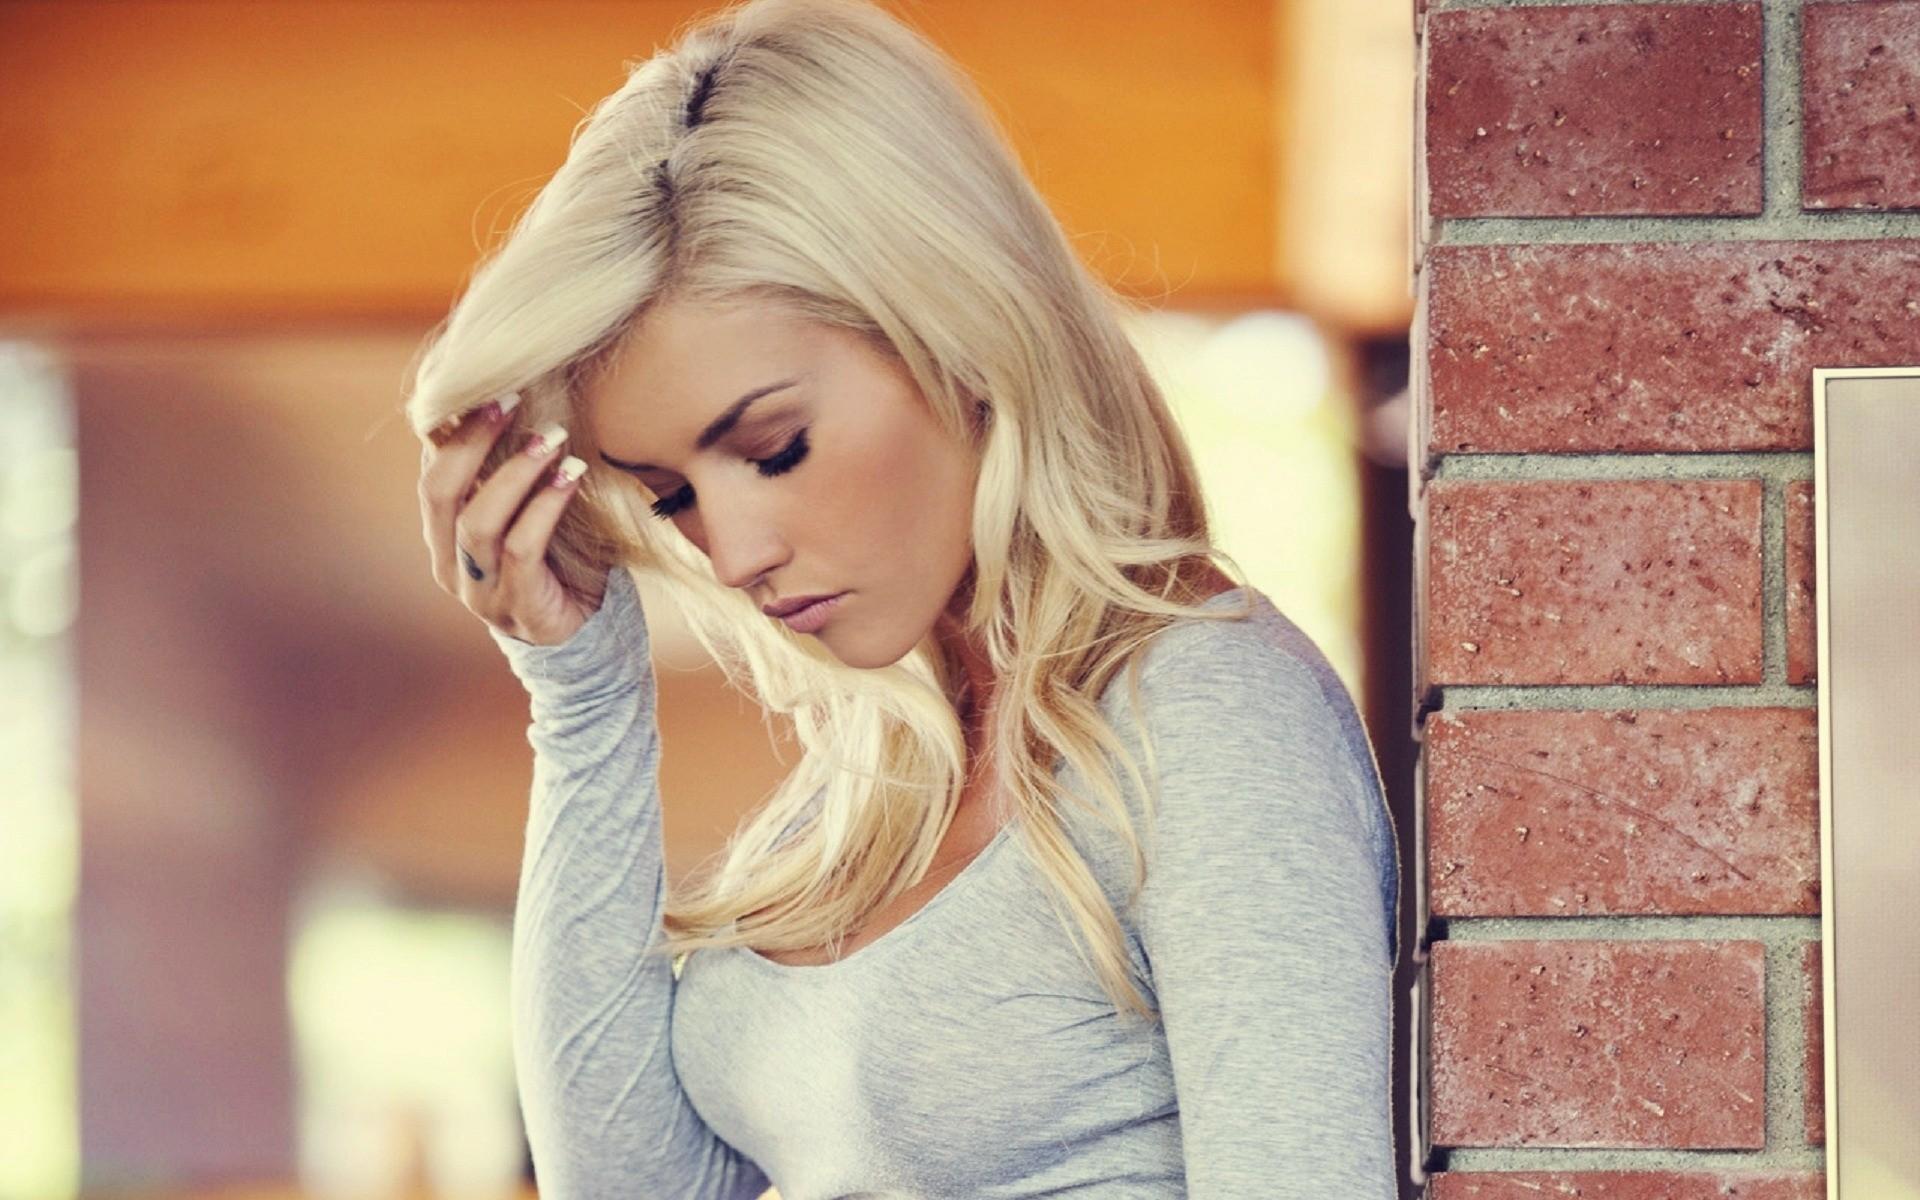 Картинки на аватарку для блондинок